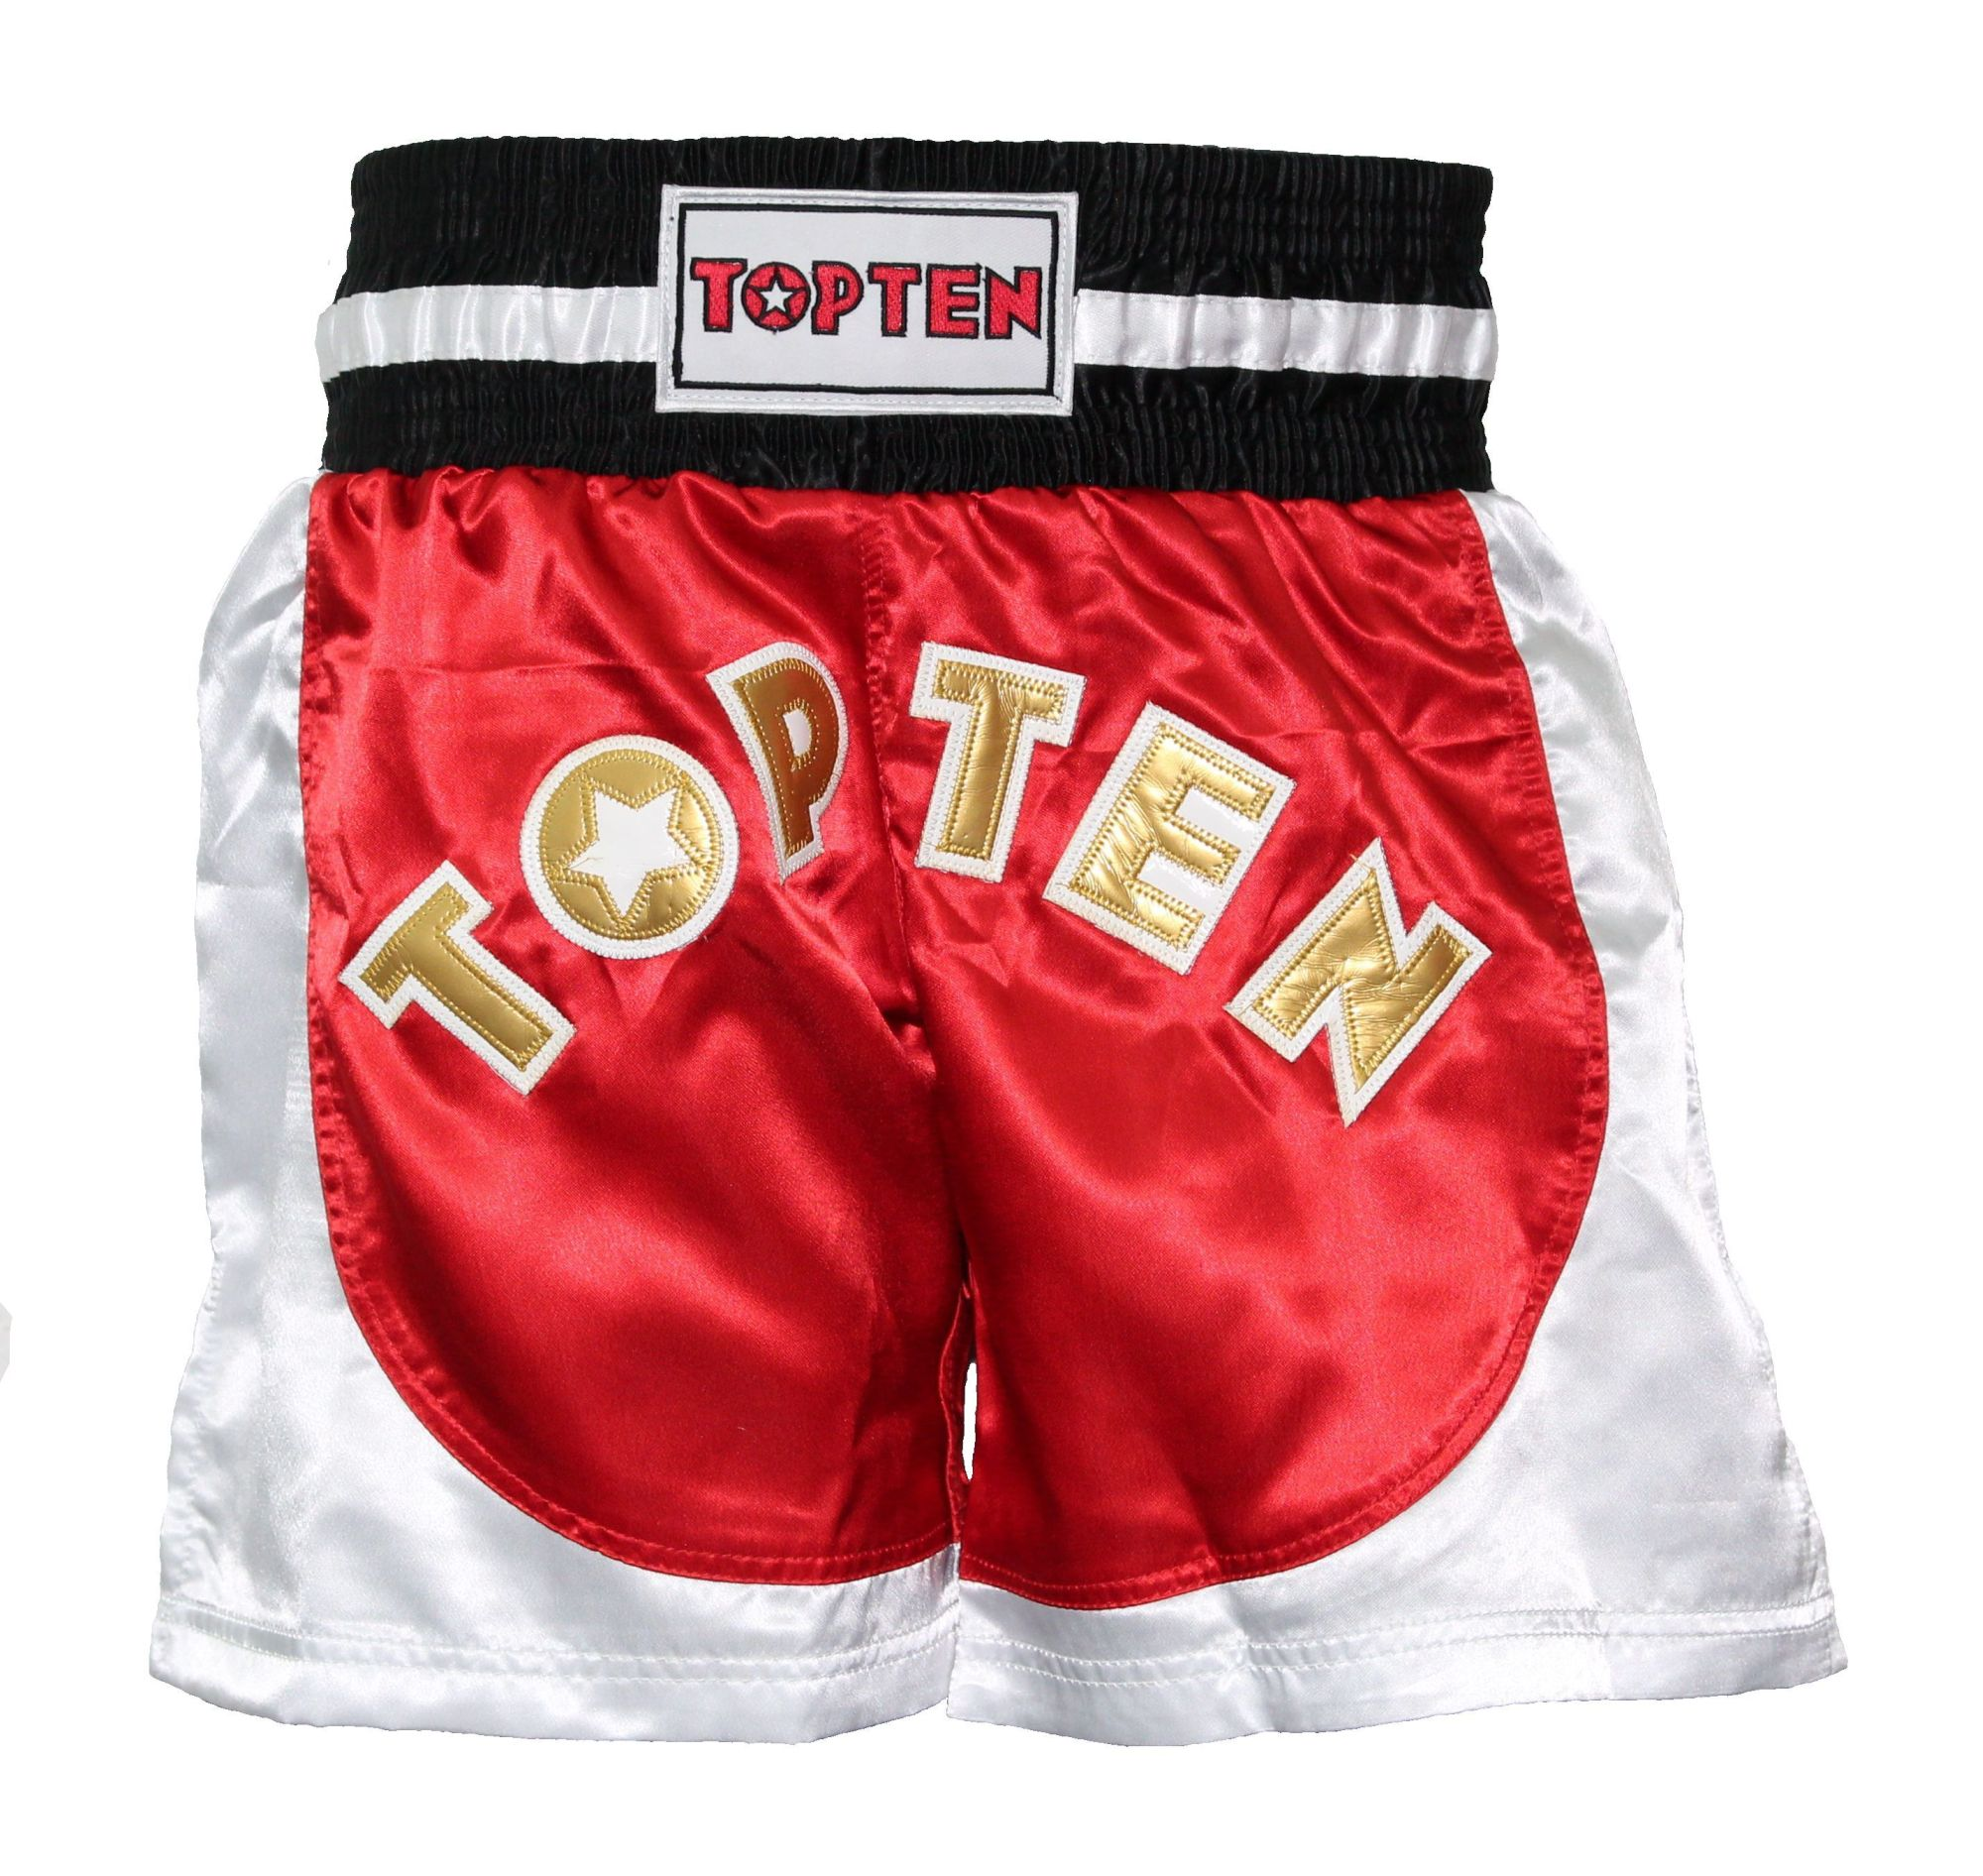 top-ten-kickboxing-shorts-kick-light-red-white